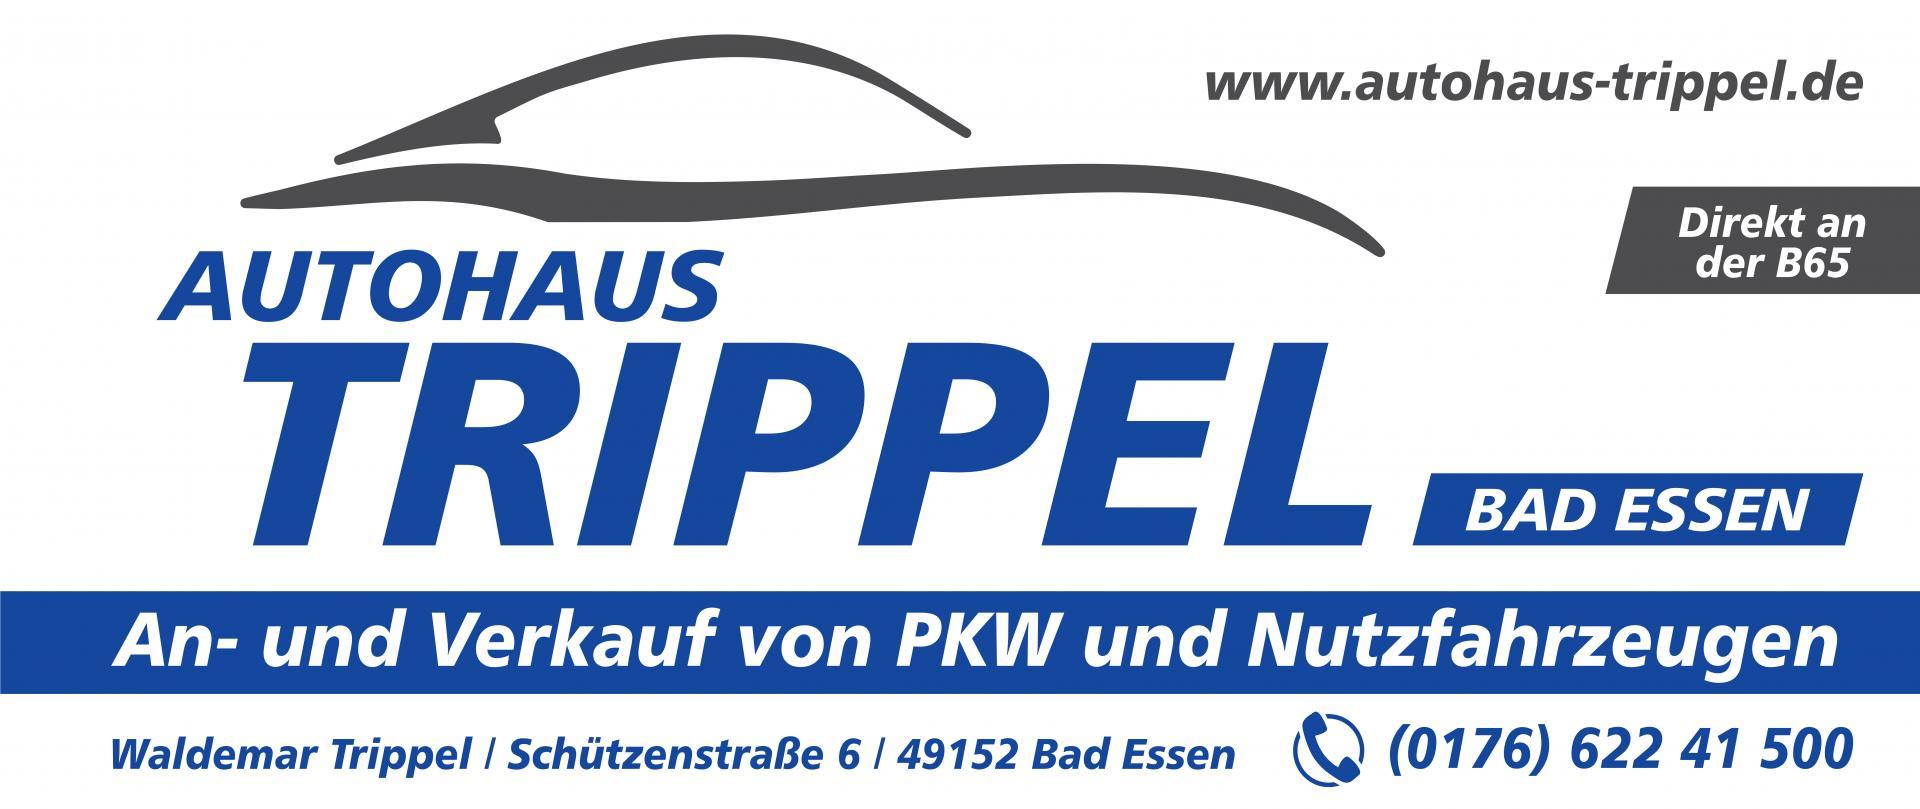 Autohaus Trippel